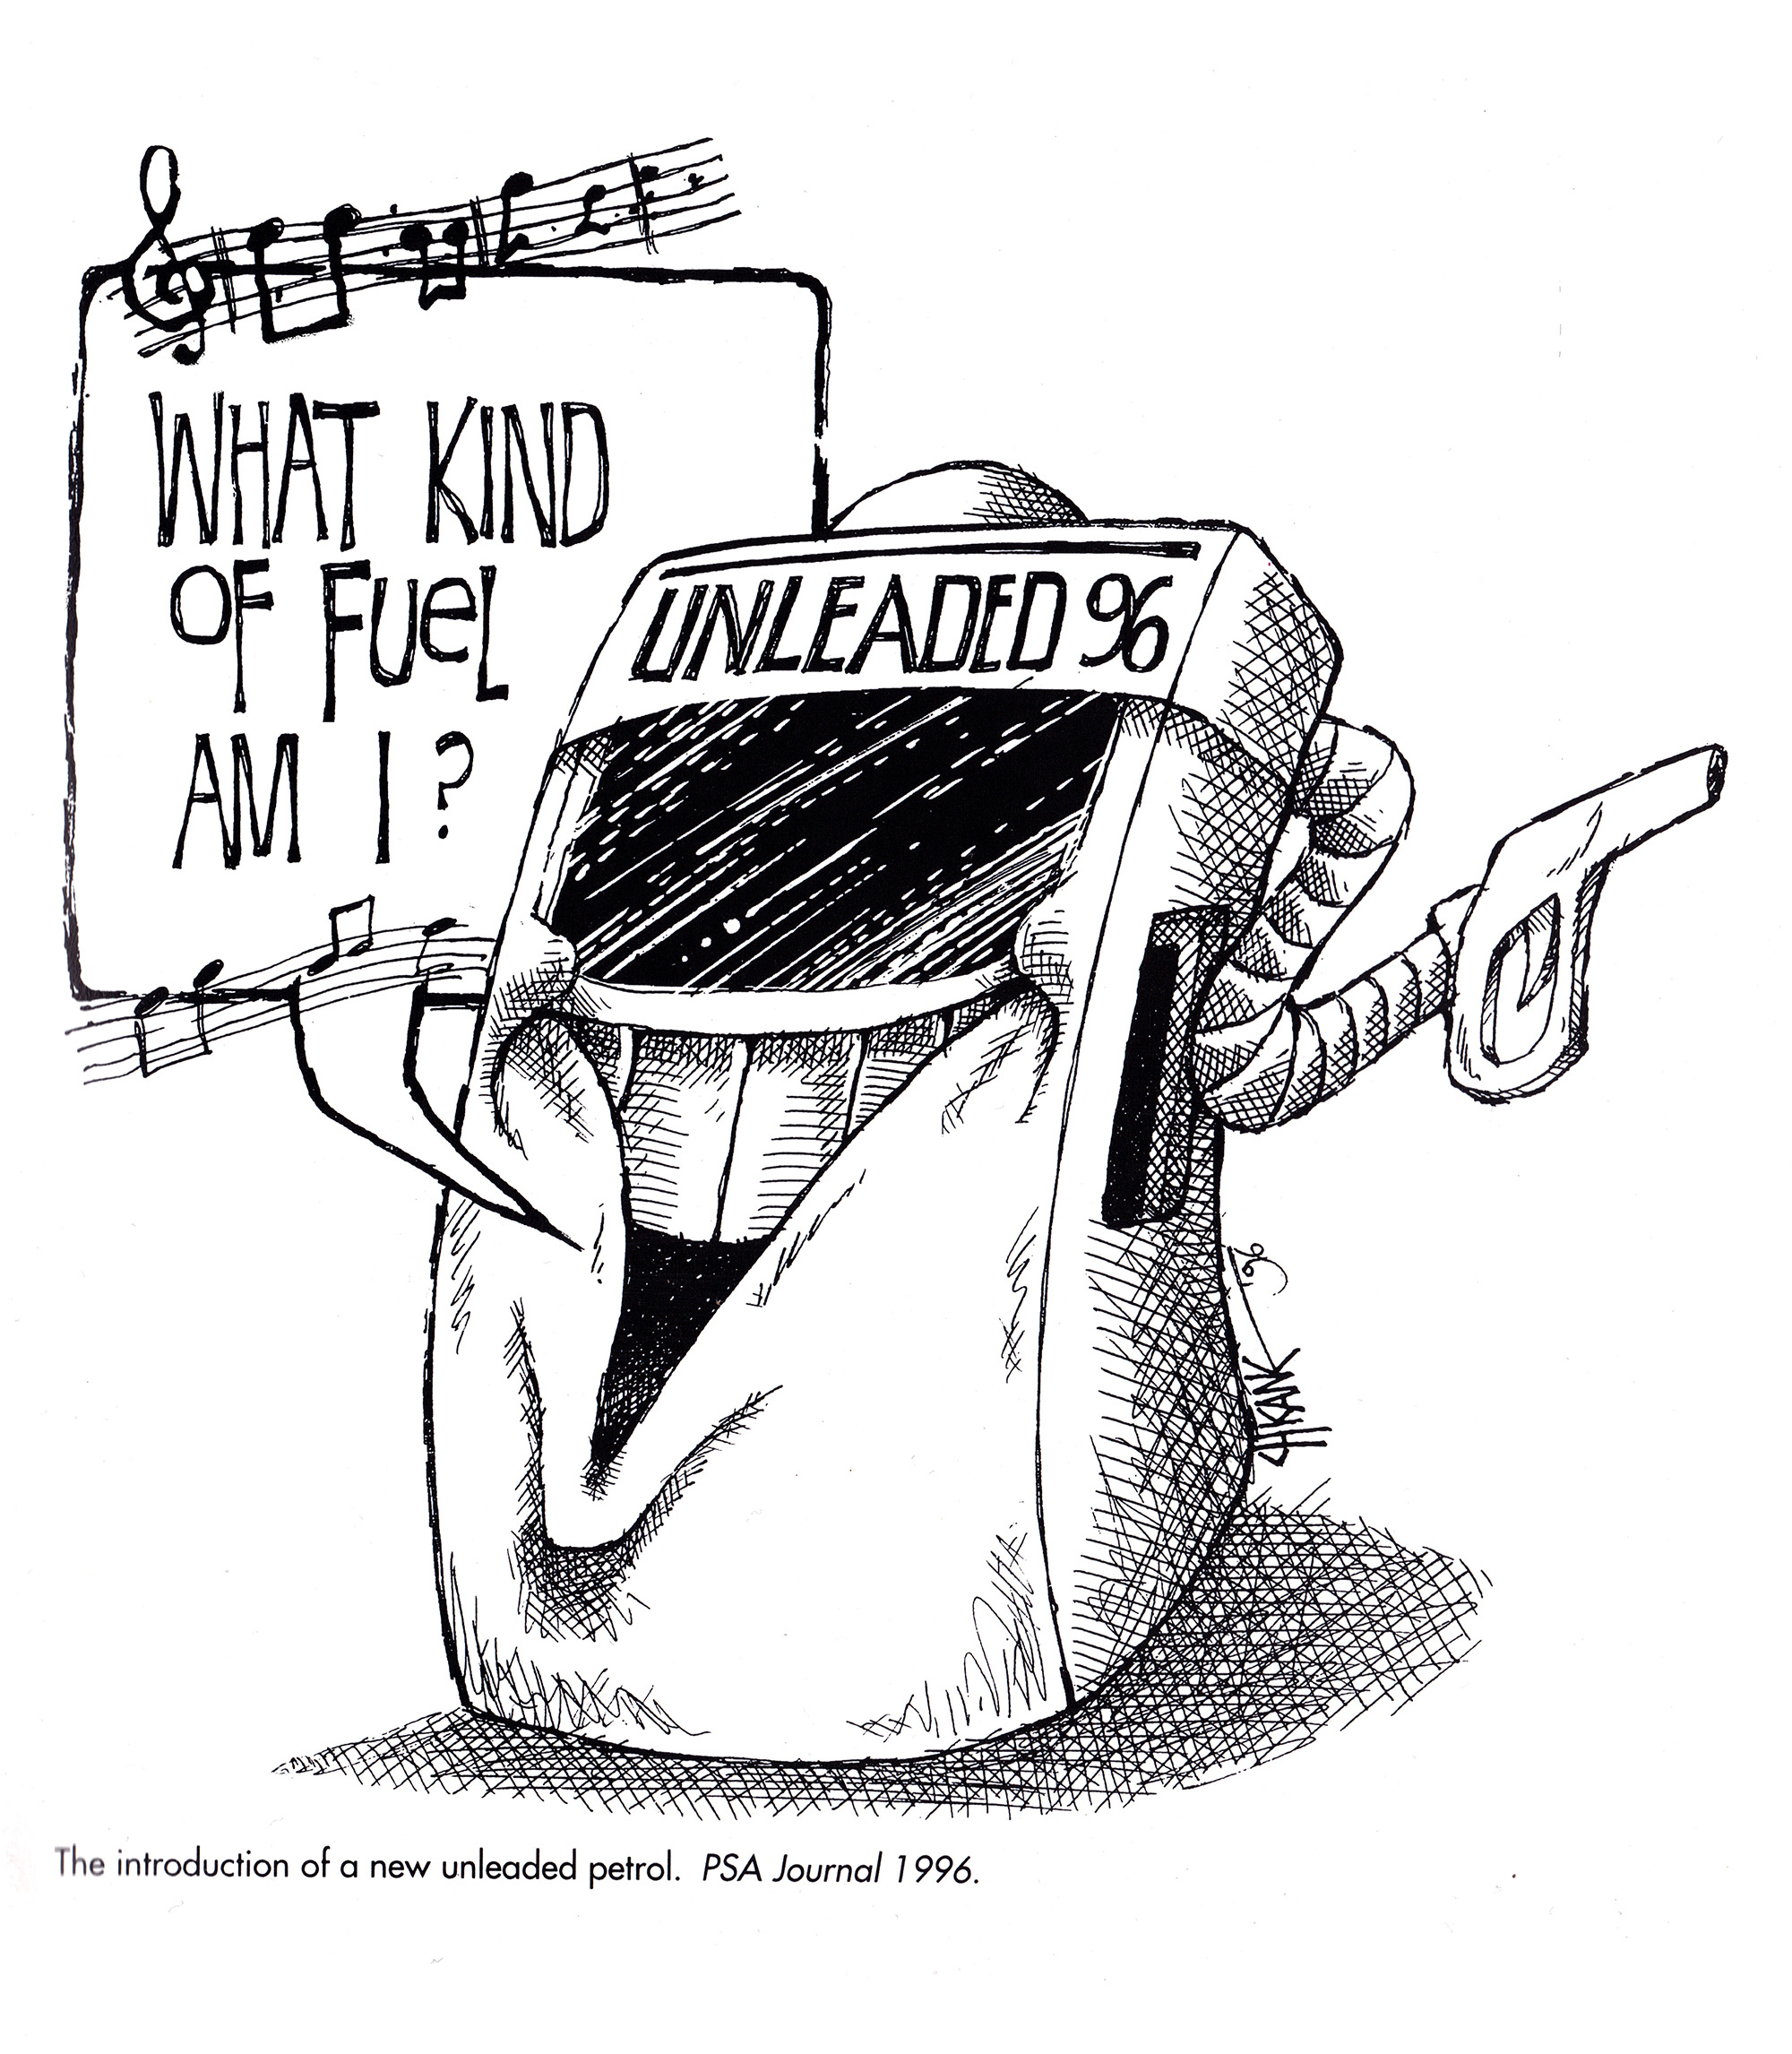 Unleaded fuel cartoon by Chicane